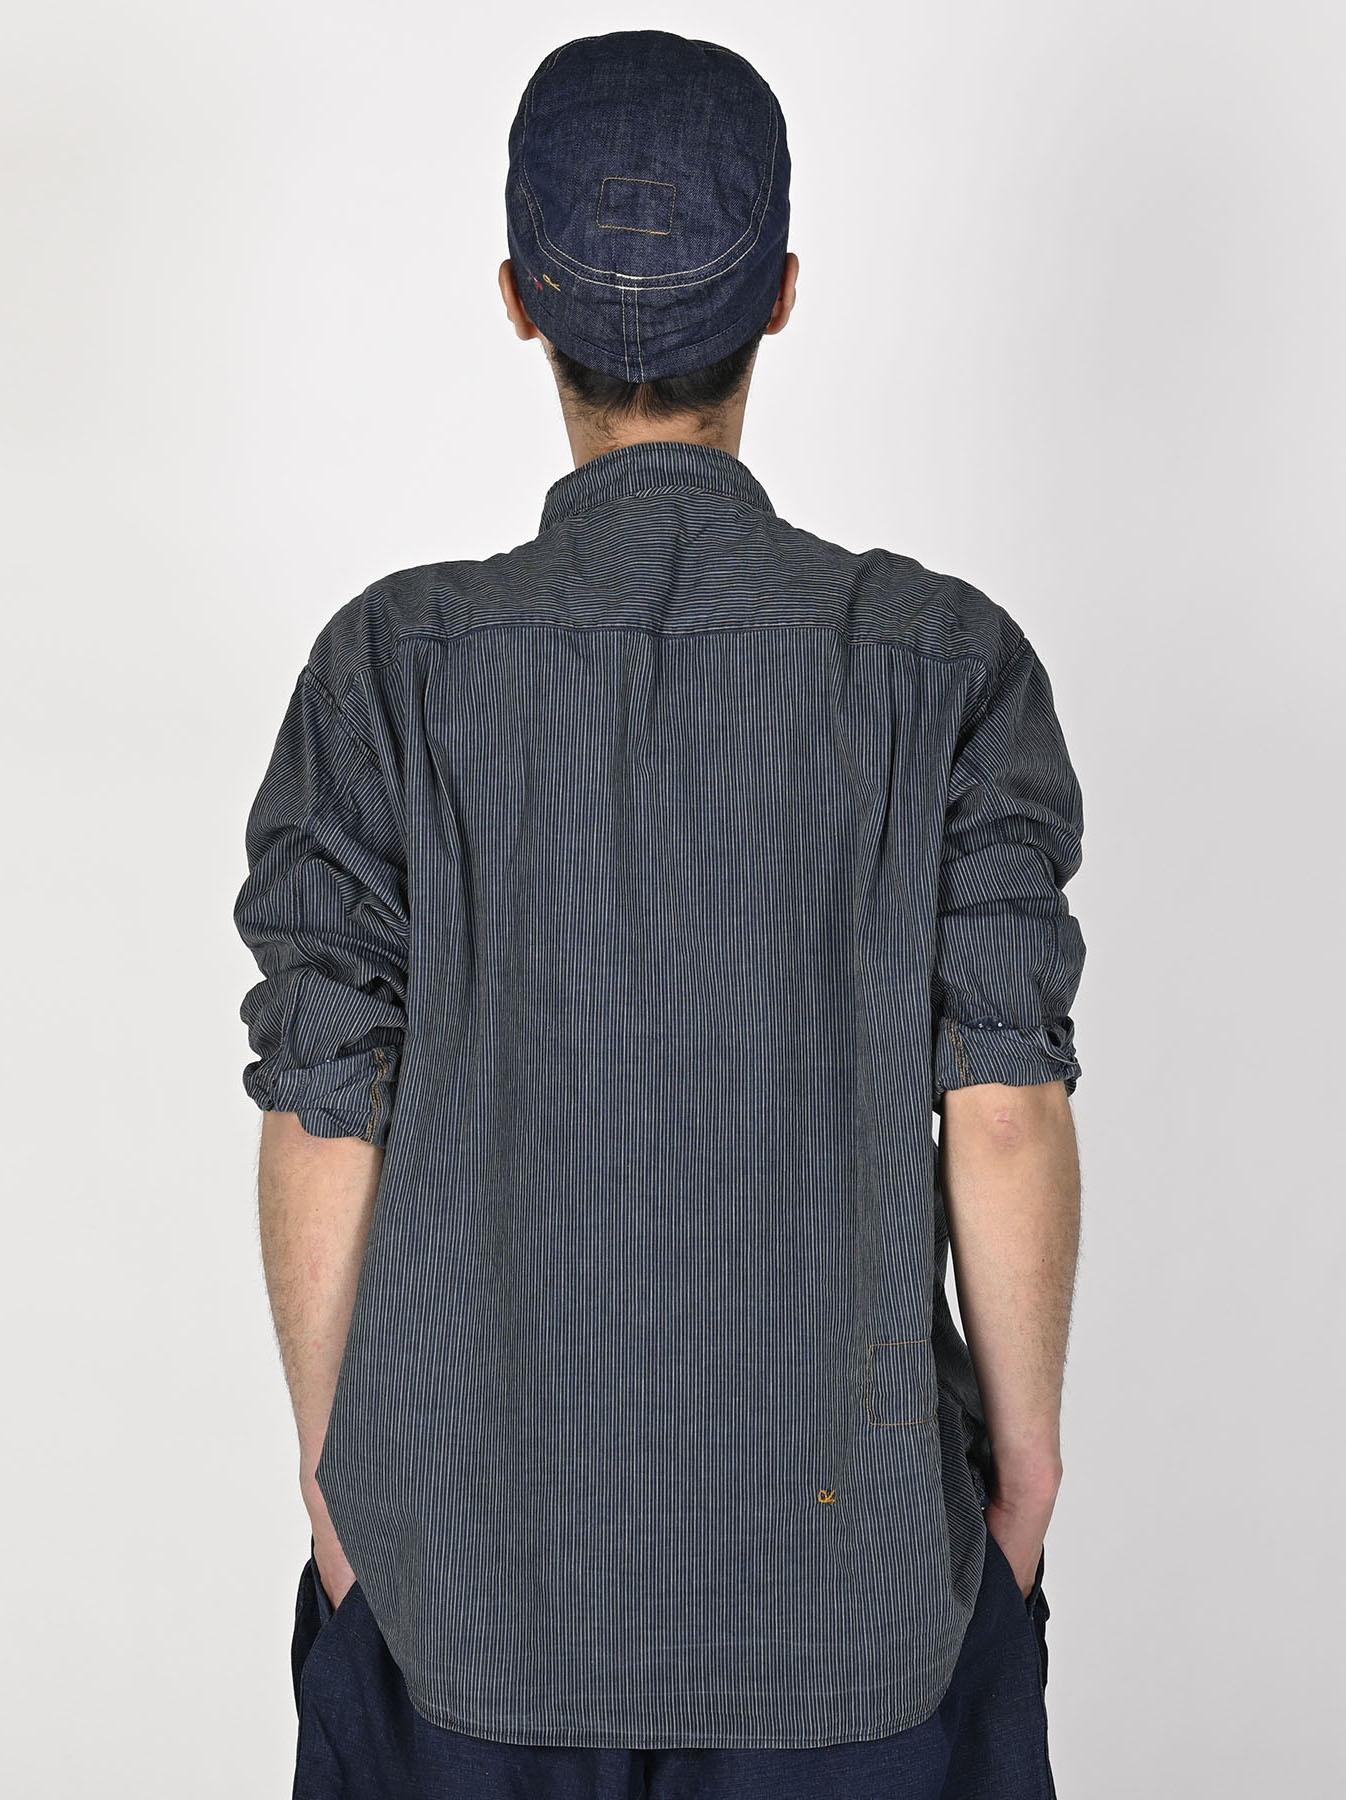 Indigo Hickory Tappet Ocean Stand Shirt-4